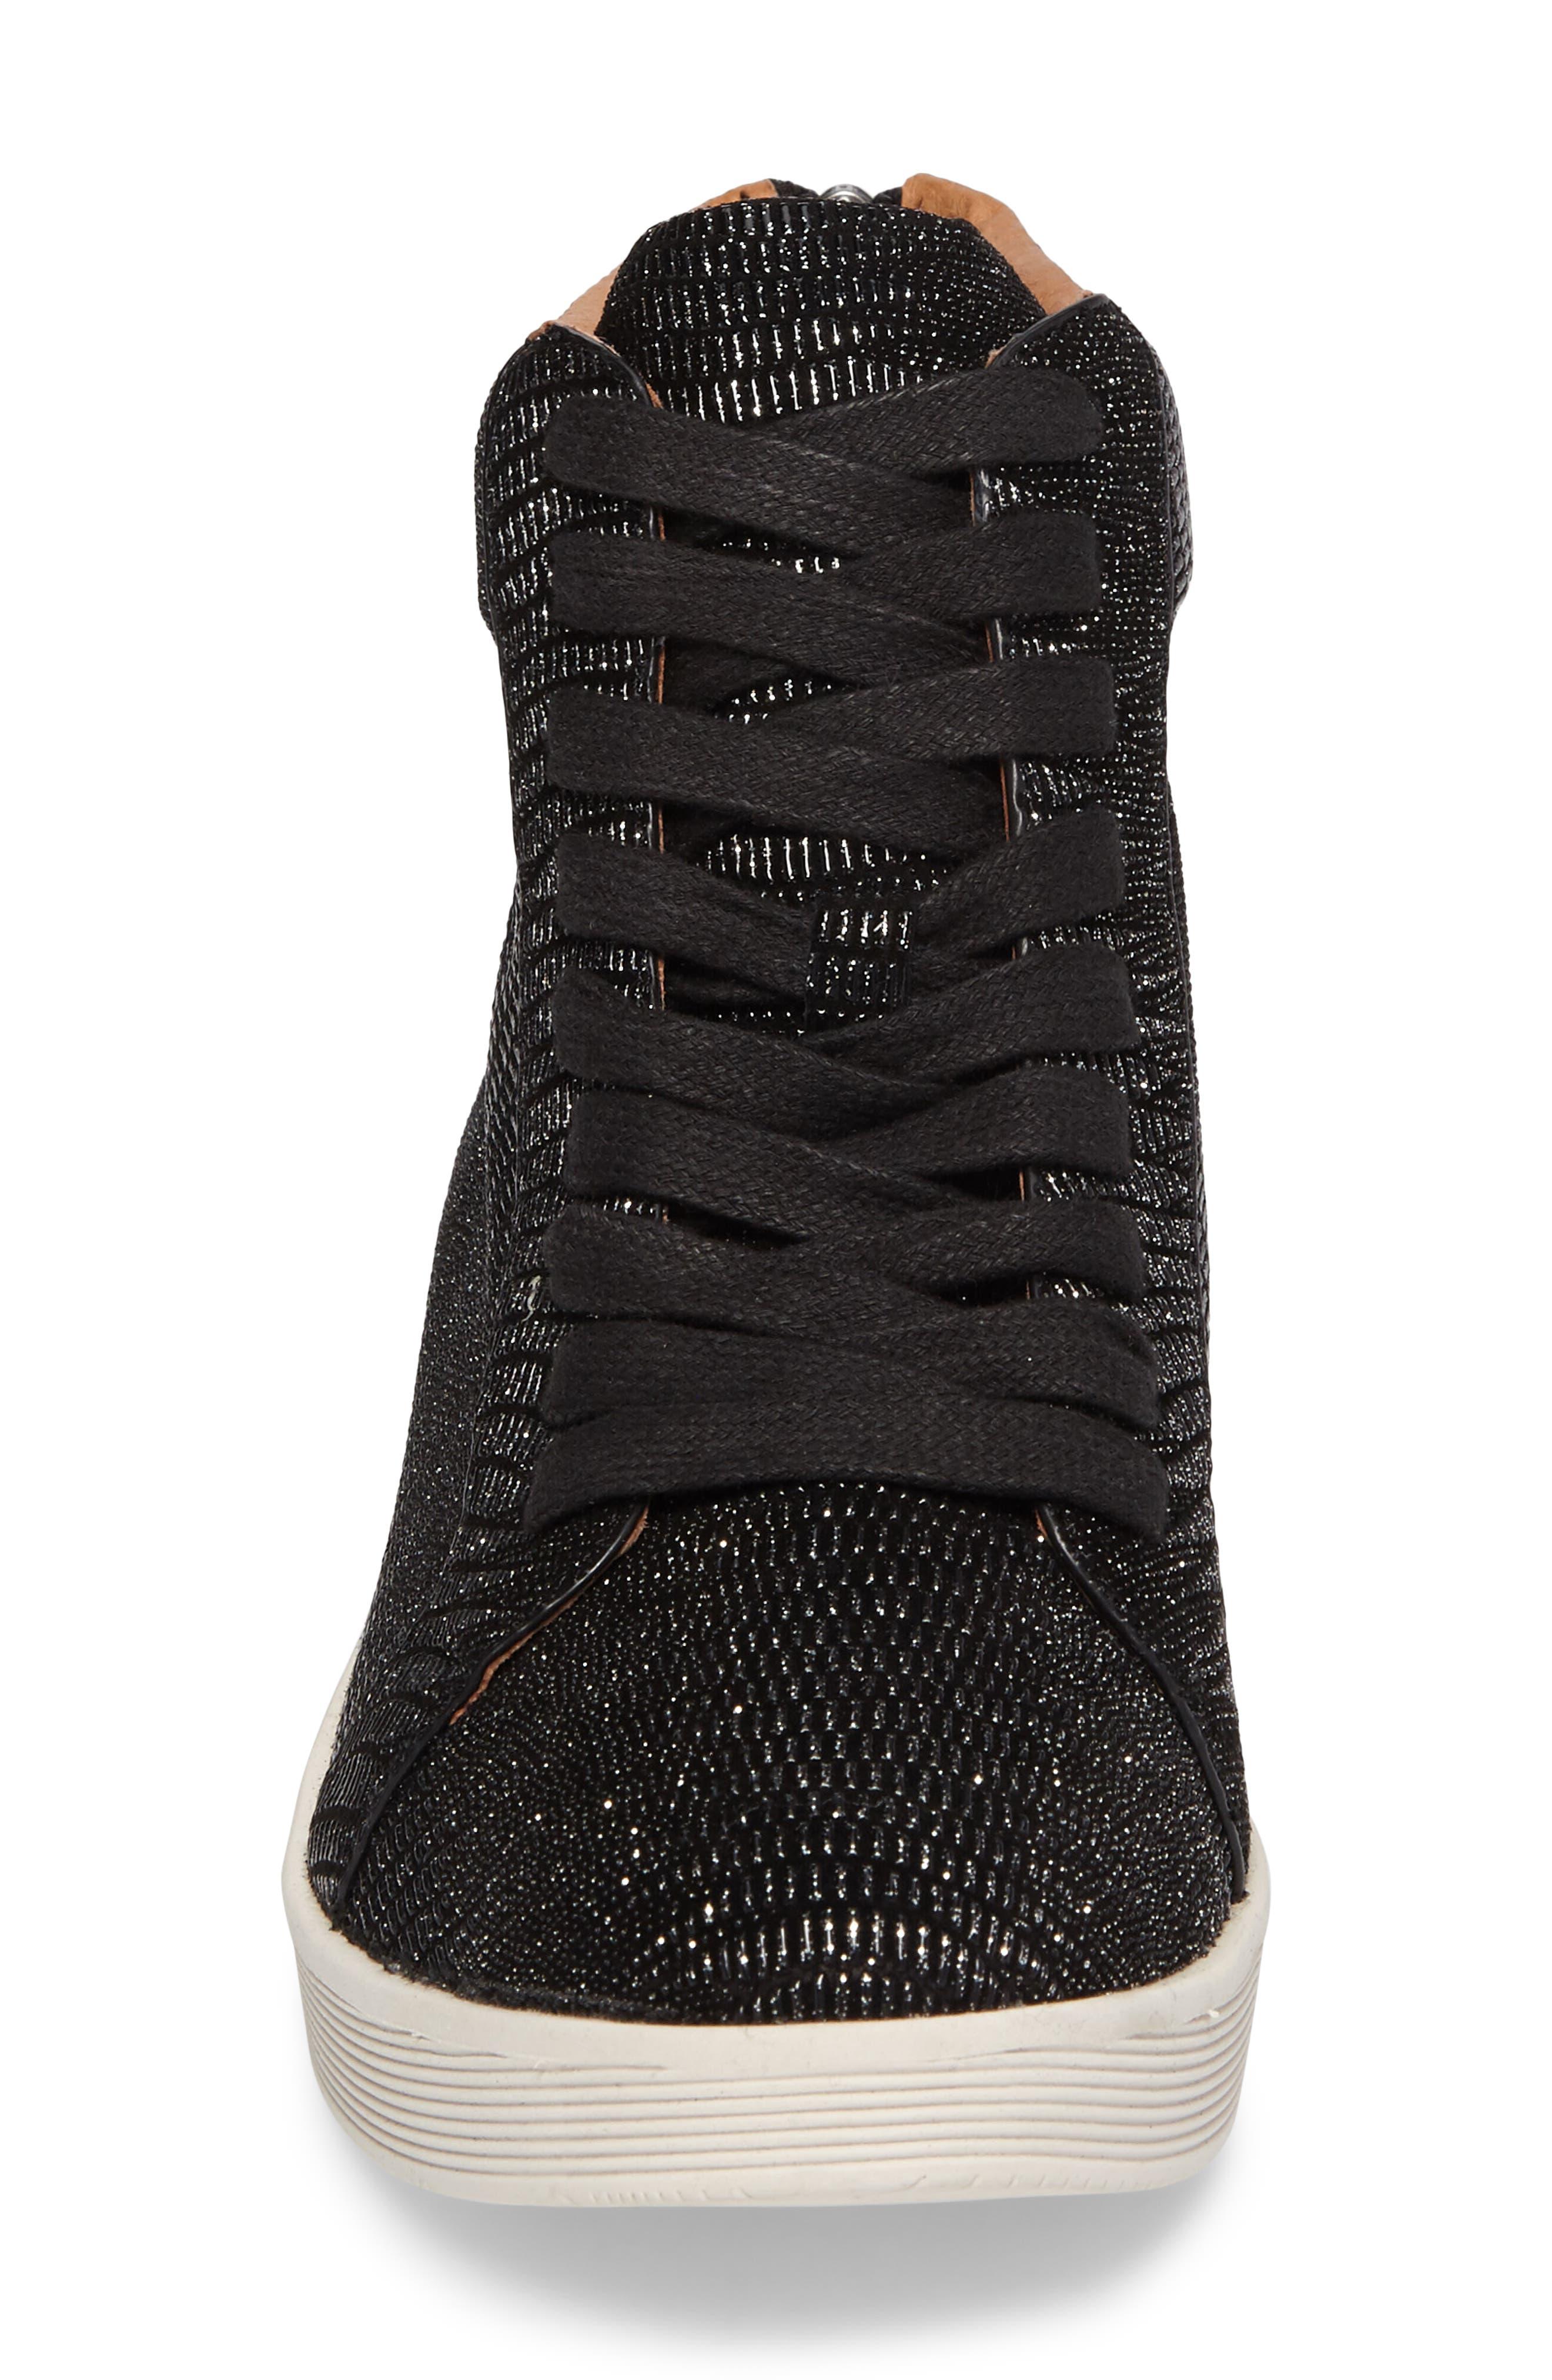 Helka High Top Sneaker,                             Alternate thumbnail 4, color,                             001